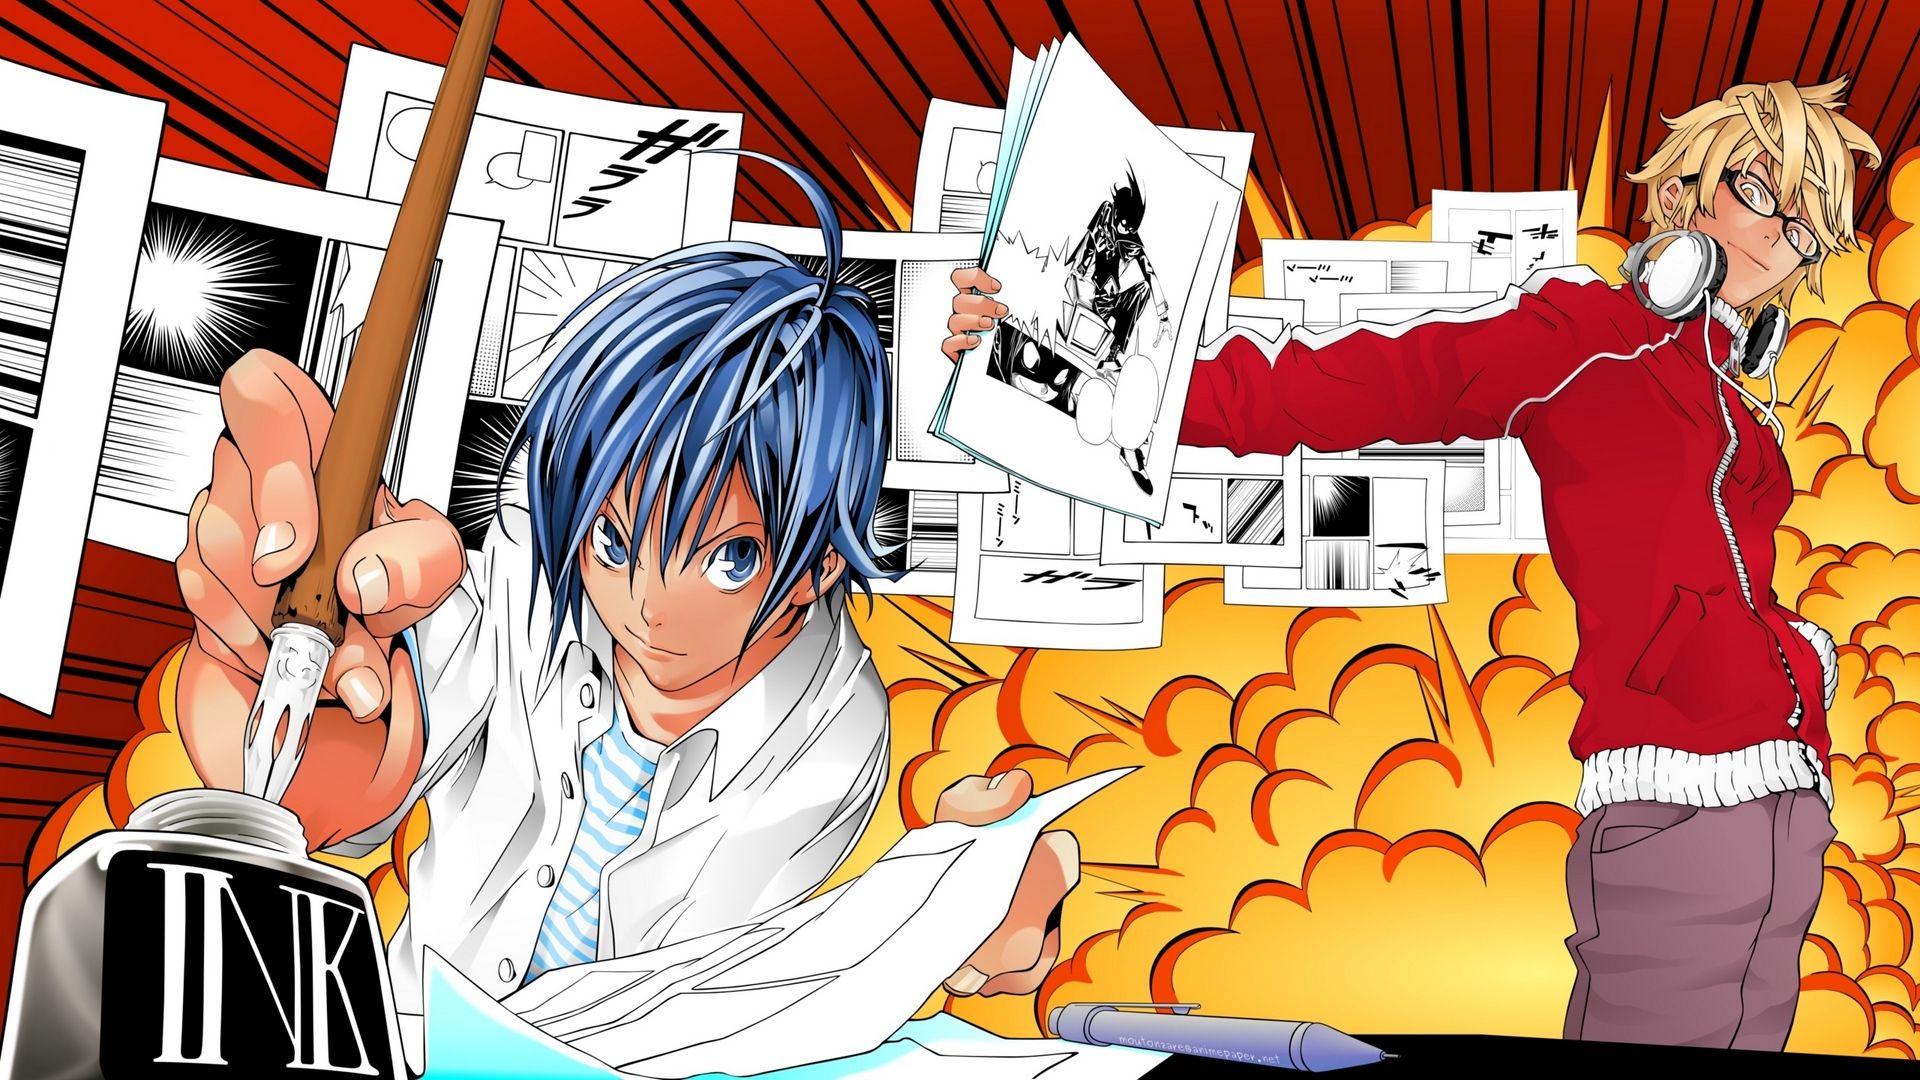 Bakuman 1920x1080 di 2020 Manga